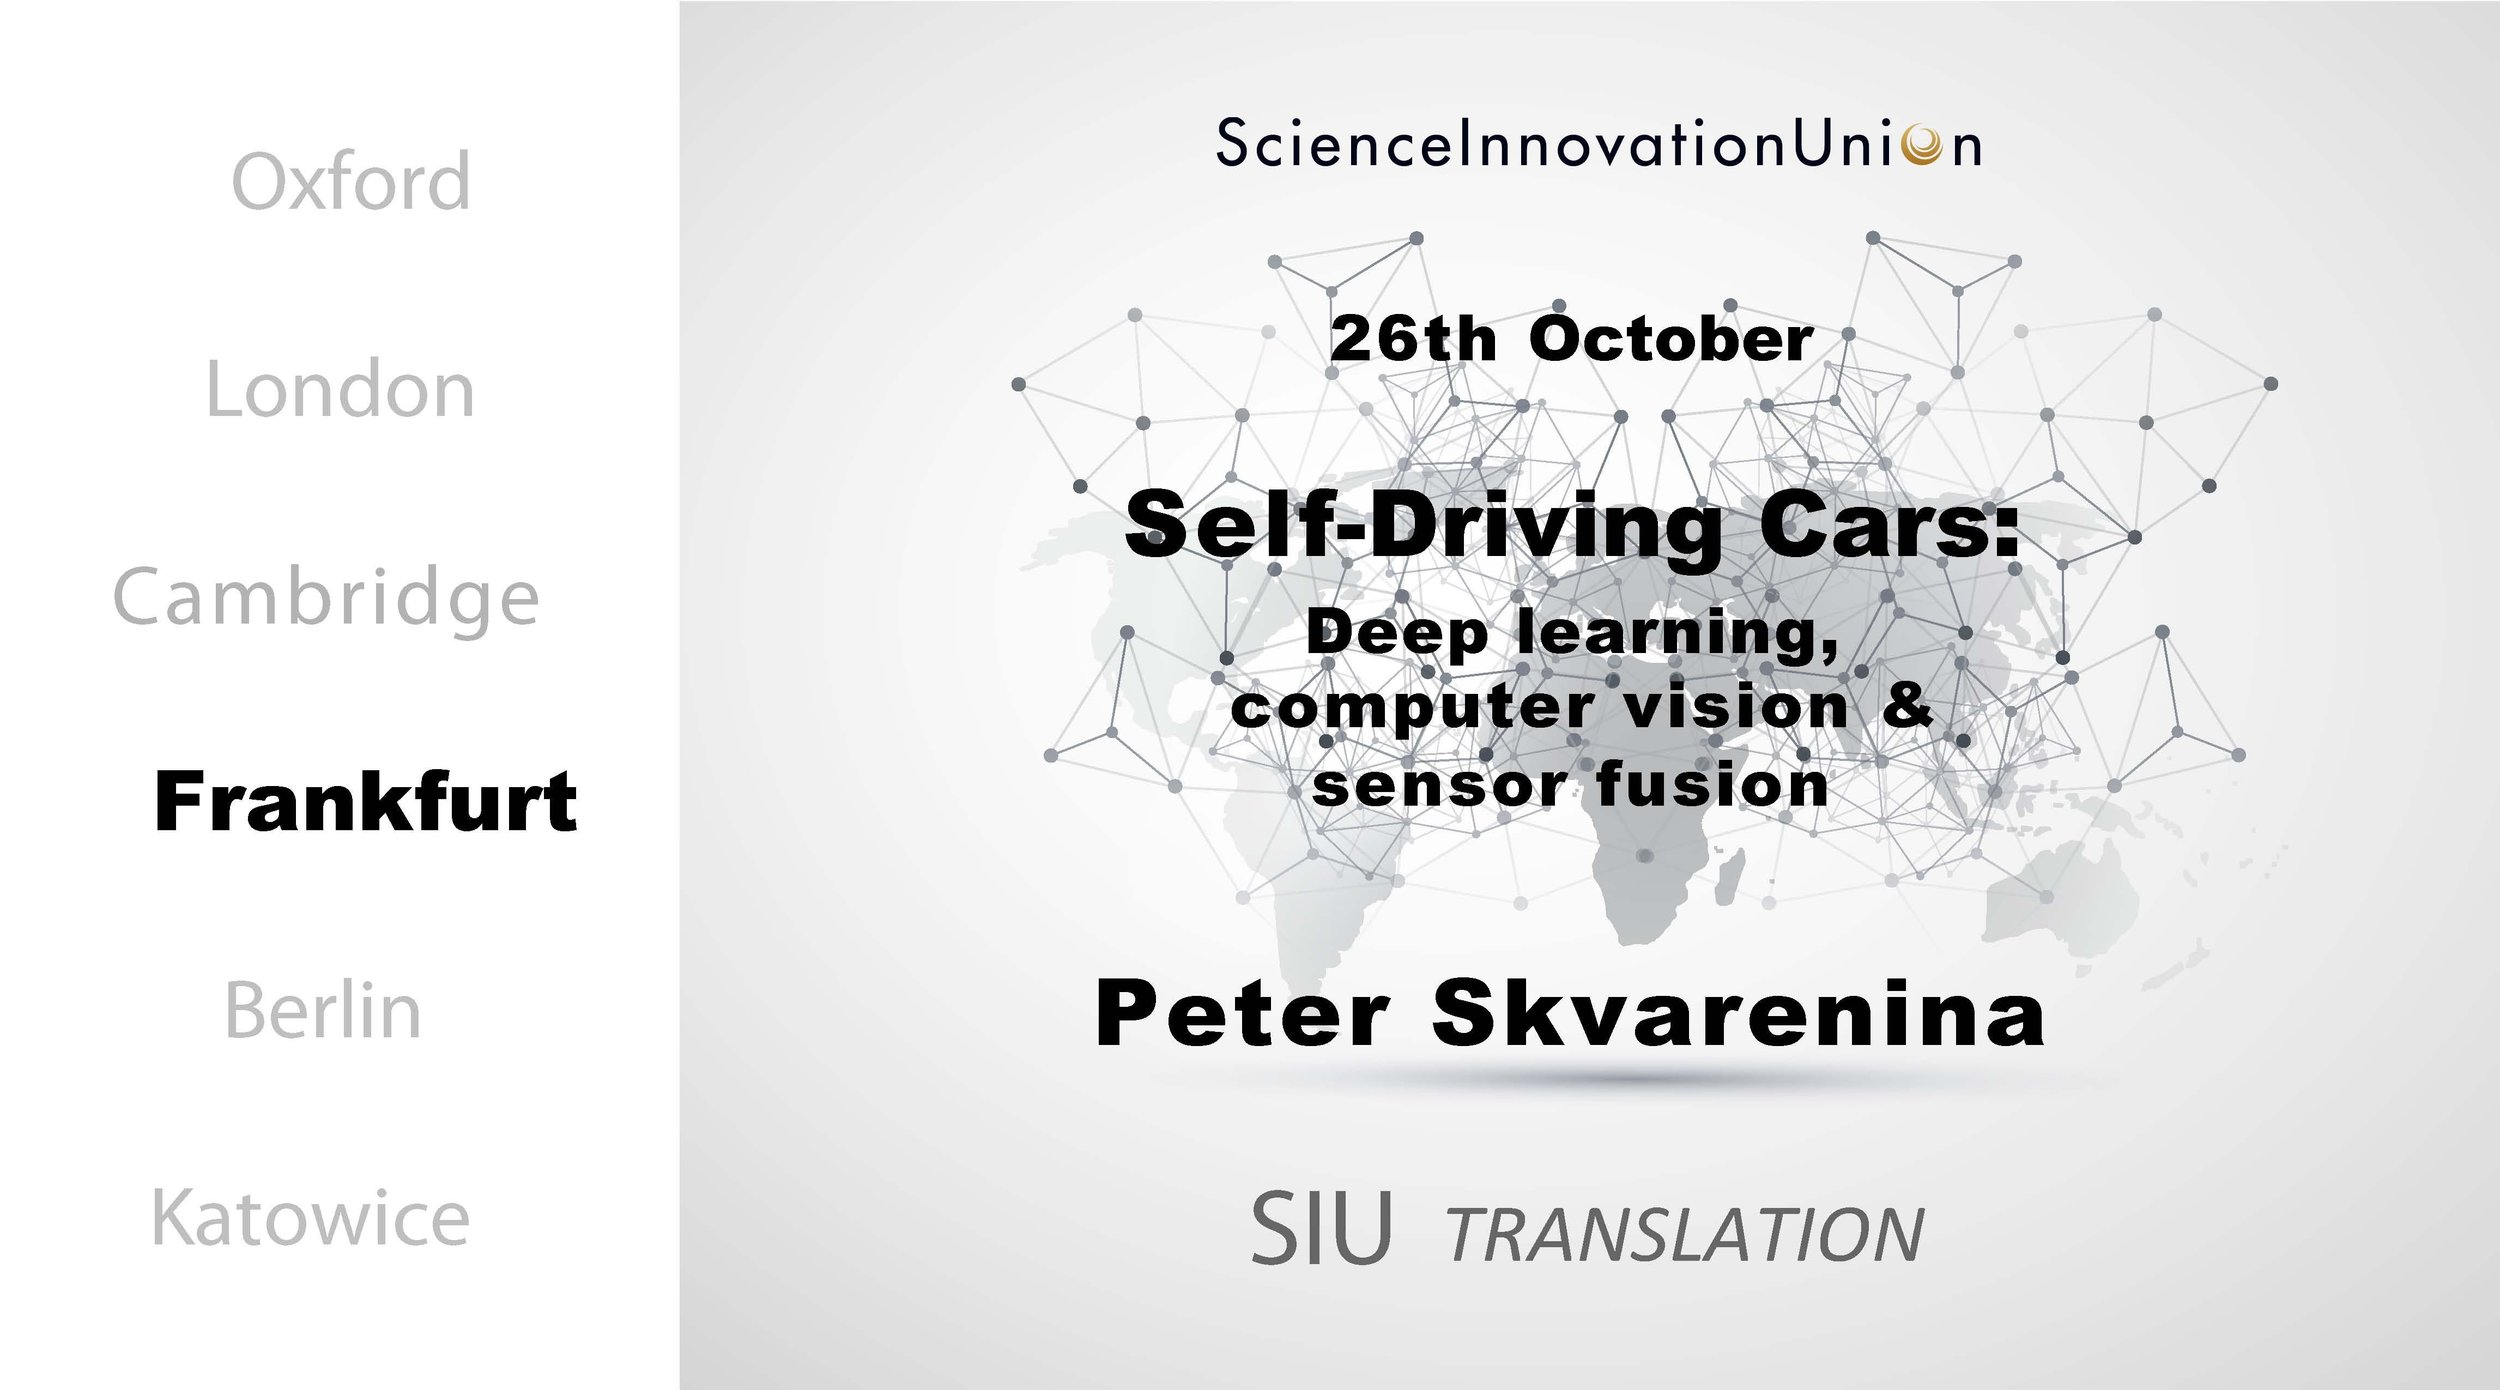 Self-Driving Cars: Deep Learning, Computer Vision & Sensor Fusion